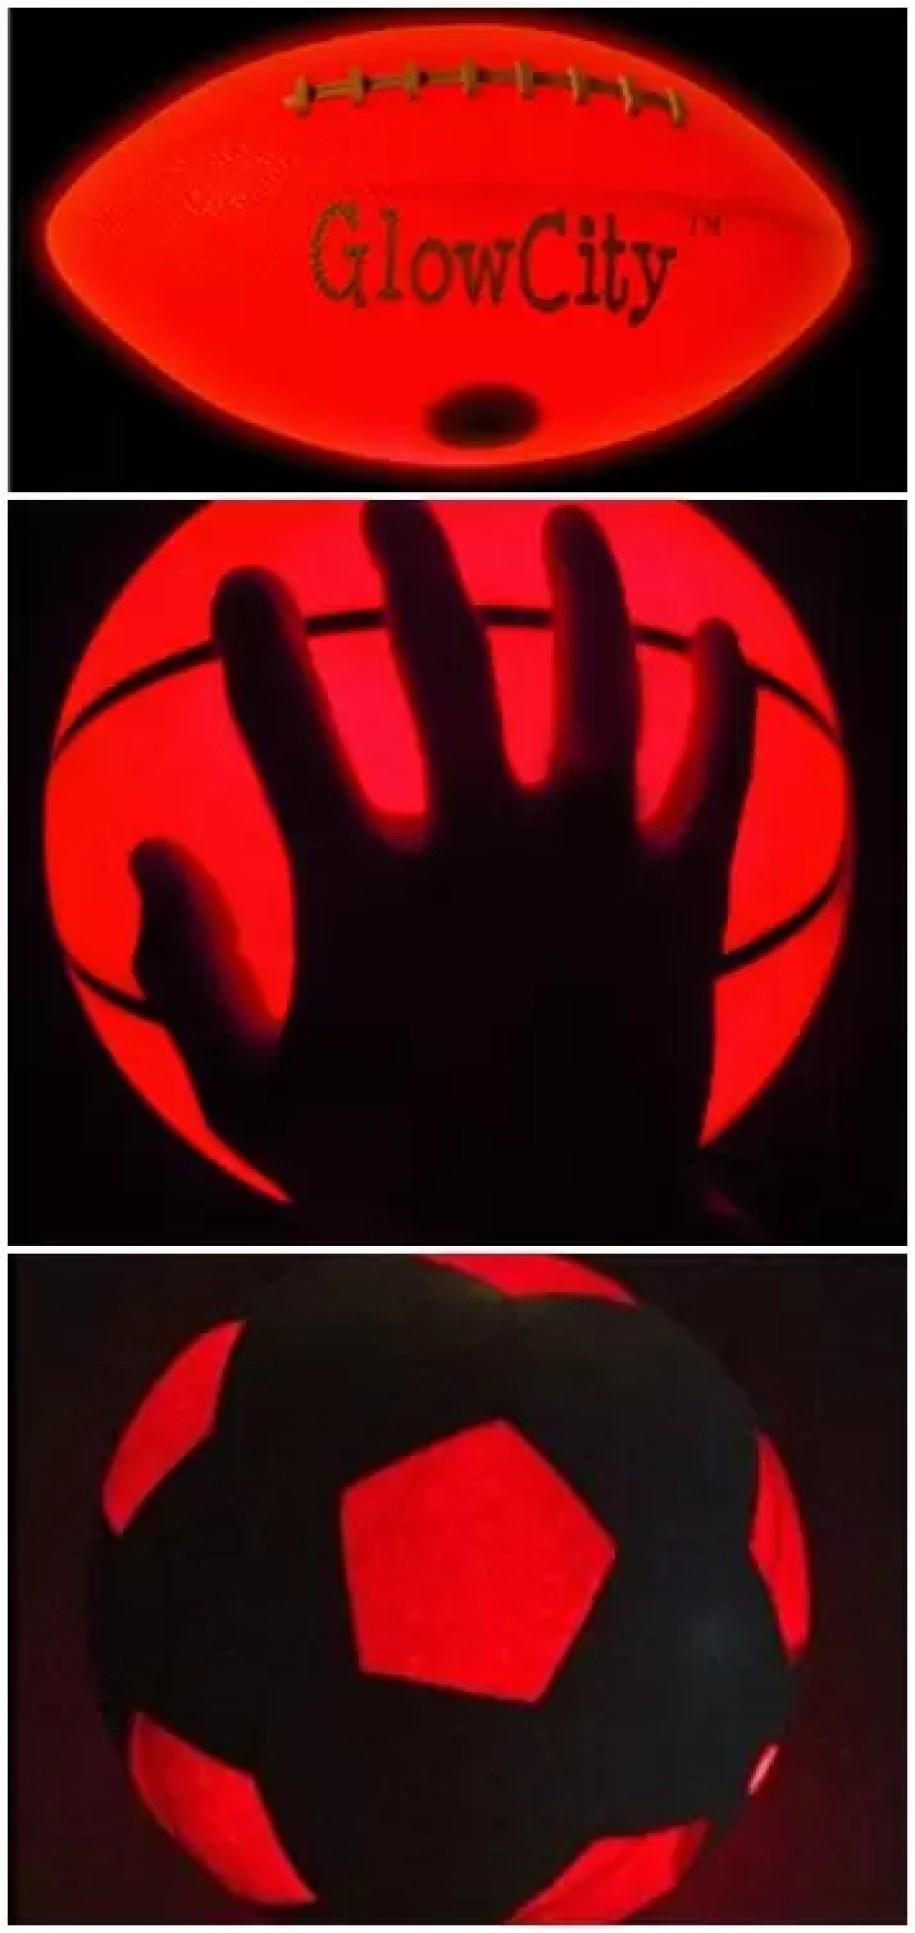 Glow in the dark games